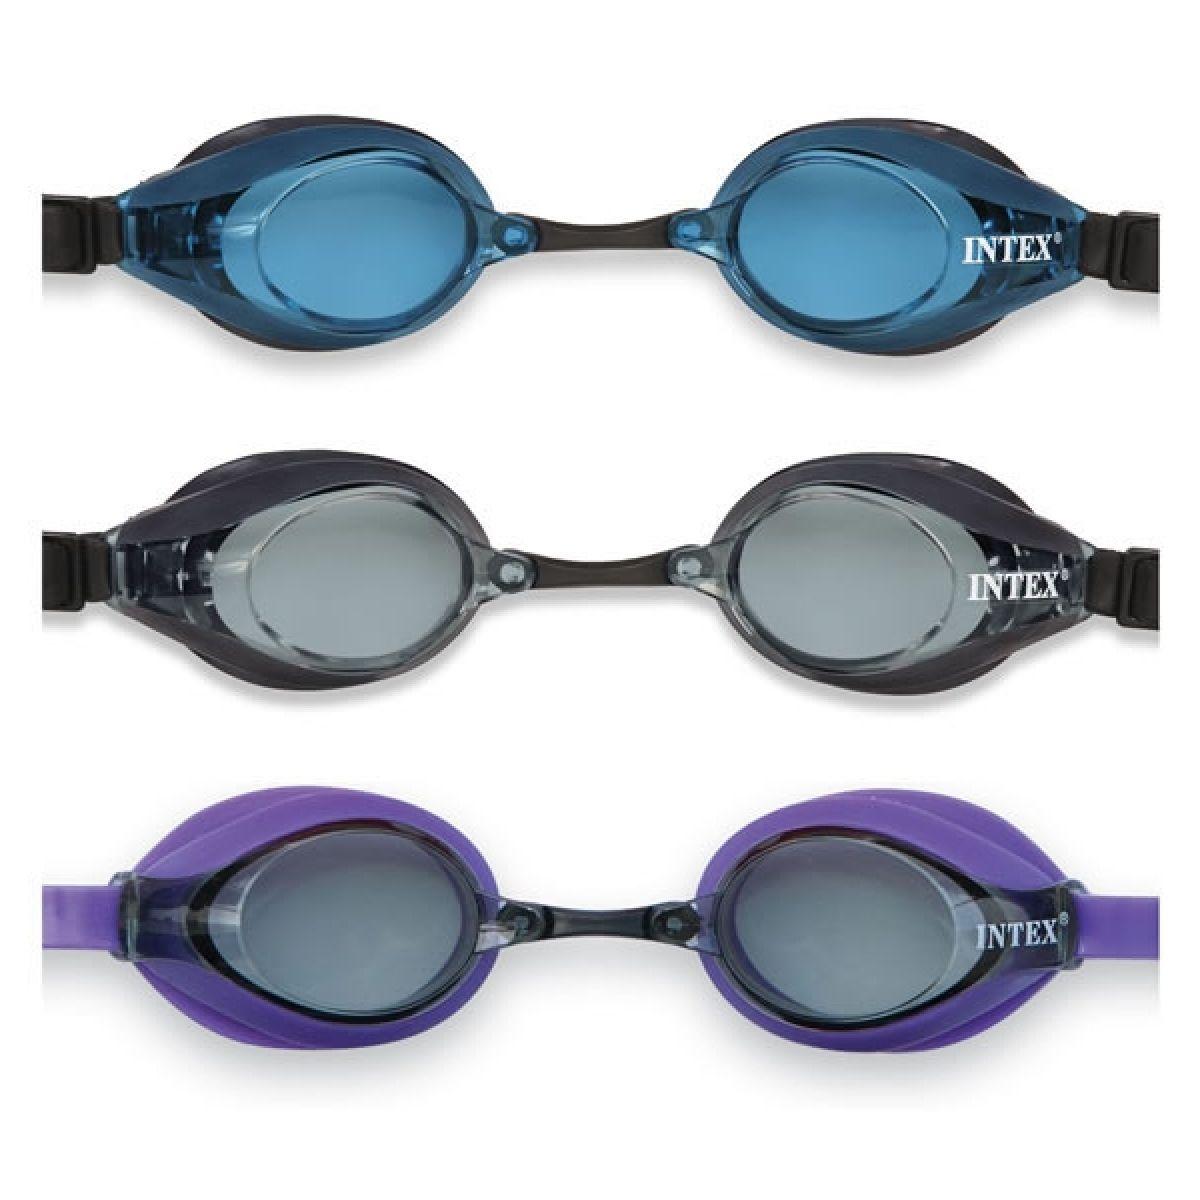 Intex 55691 Plavecké brýle Pro Racing - Modrá